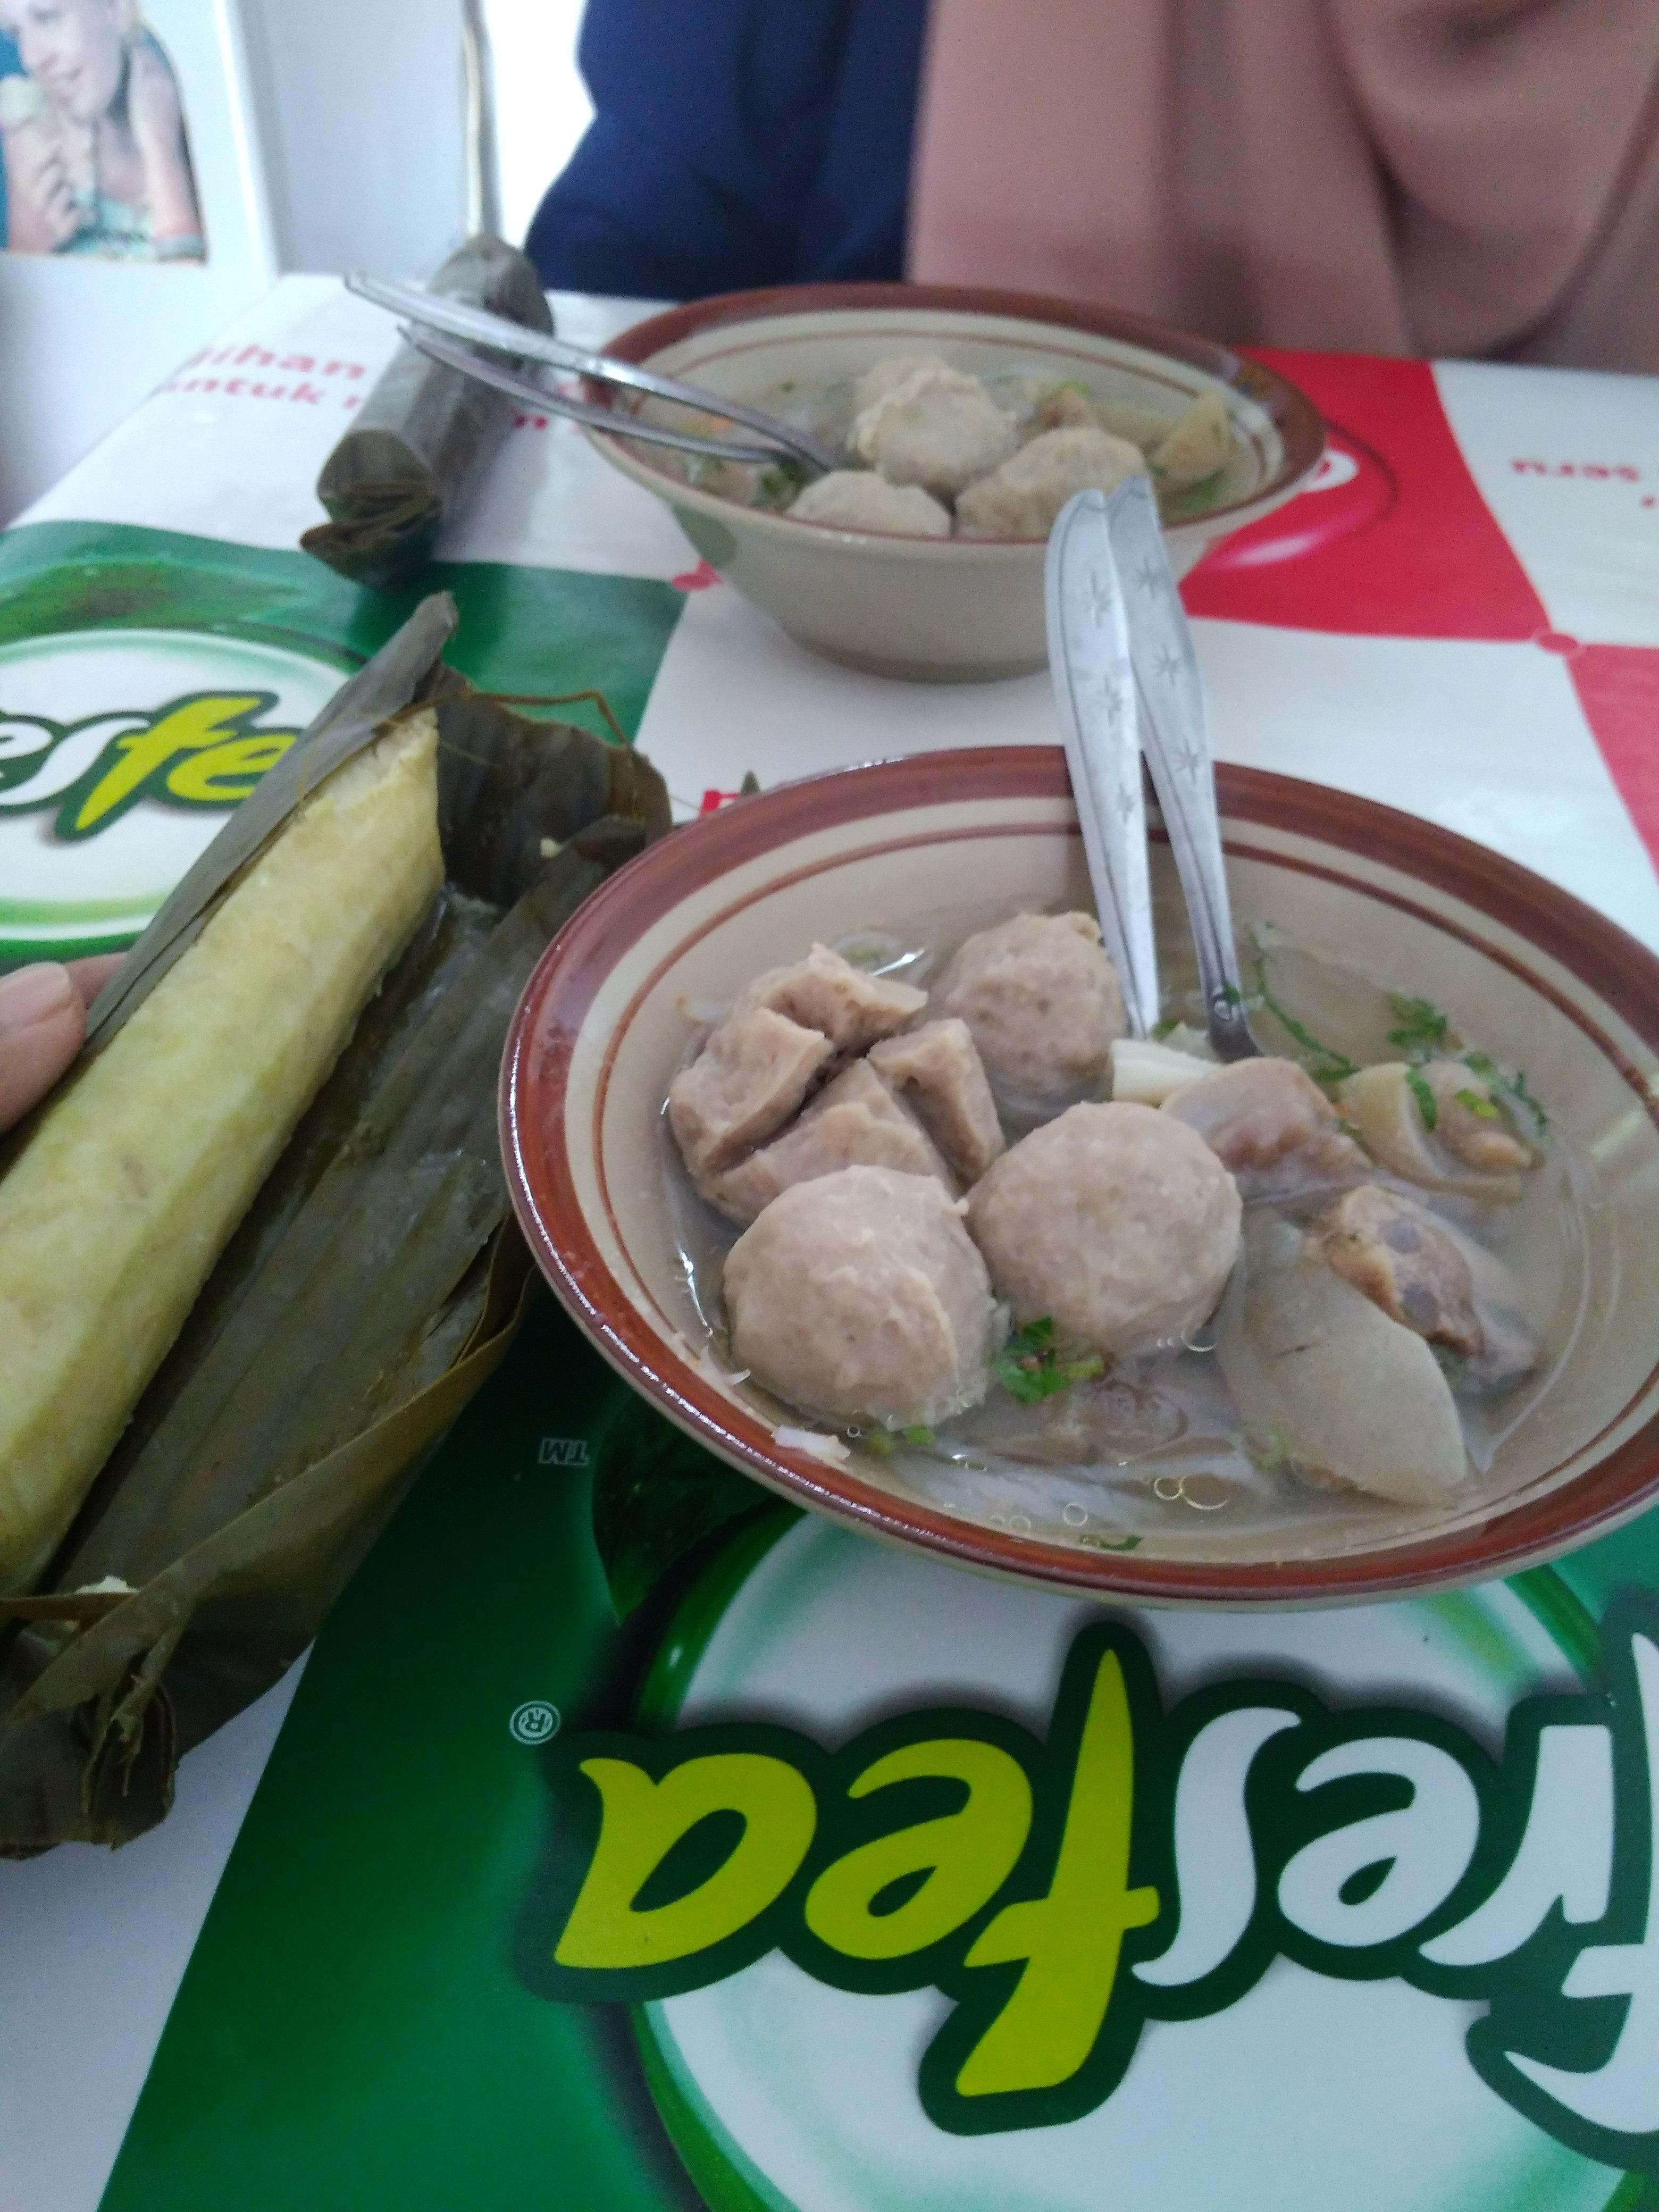 Bakso Winong Kabupaten Nganjuk Jawa Timur Kisah Anak Kost Kikos Kuliner Nganjuk Mie Ayam Bakso Enak Di Nganjuk